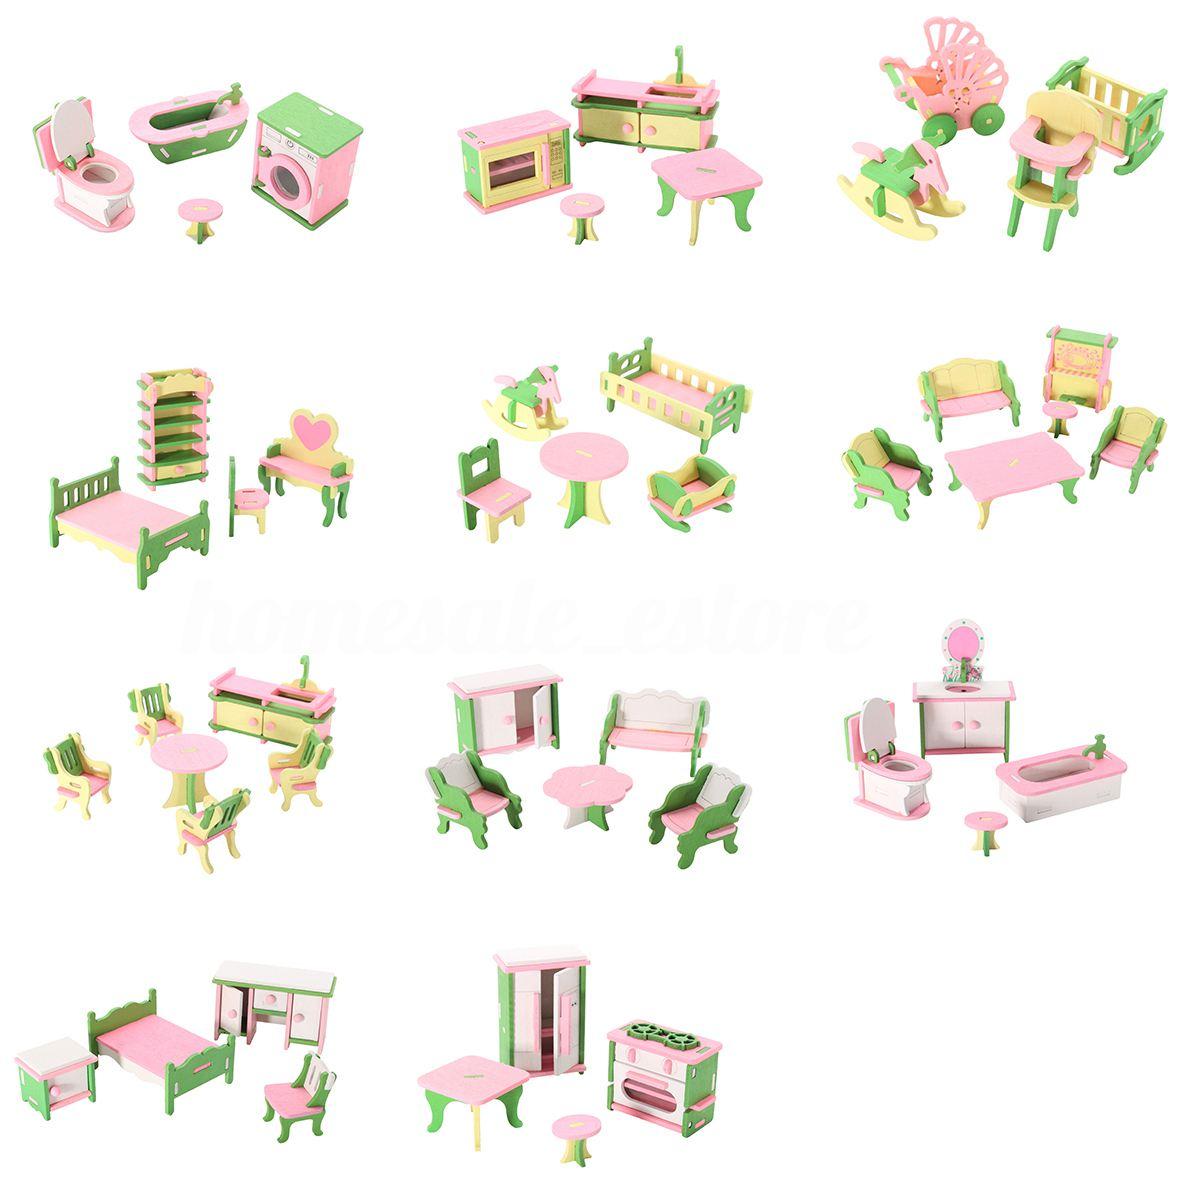 MAGICYOYO 49Pcs 11 Sets Baby Wooden Furniture Dolls House Miniature Child Play Toys GiftsMAGICYOYO 49Pcs 11 Sets Baby Wooden Furniture Dolls House Miniature Child Play Toys Gifts